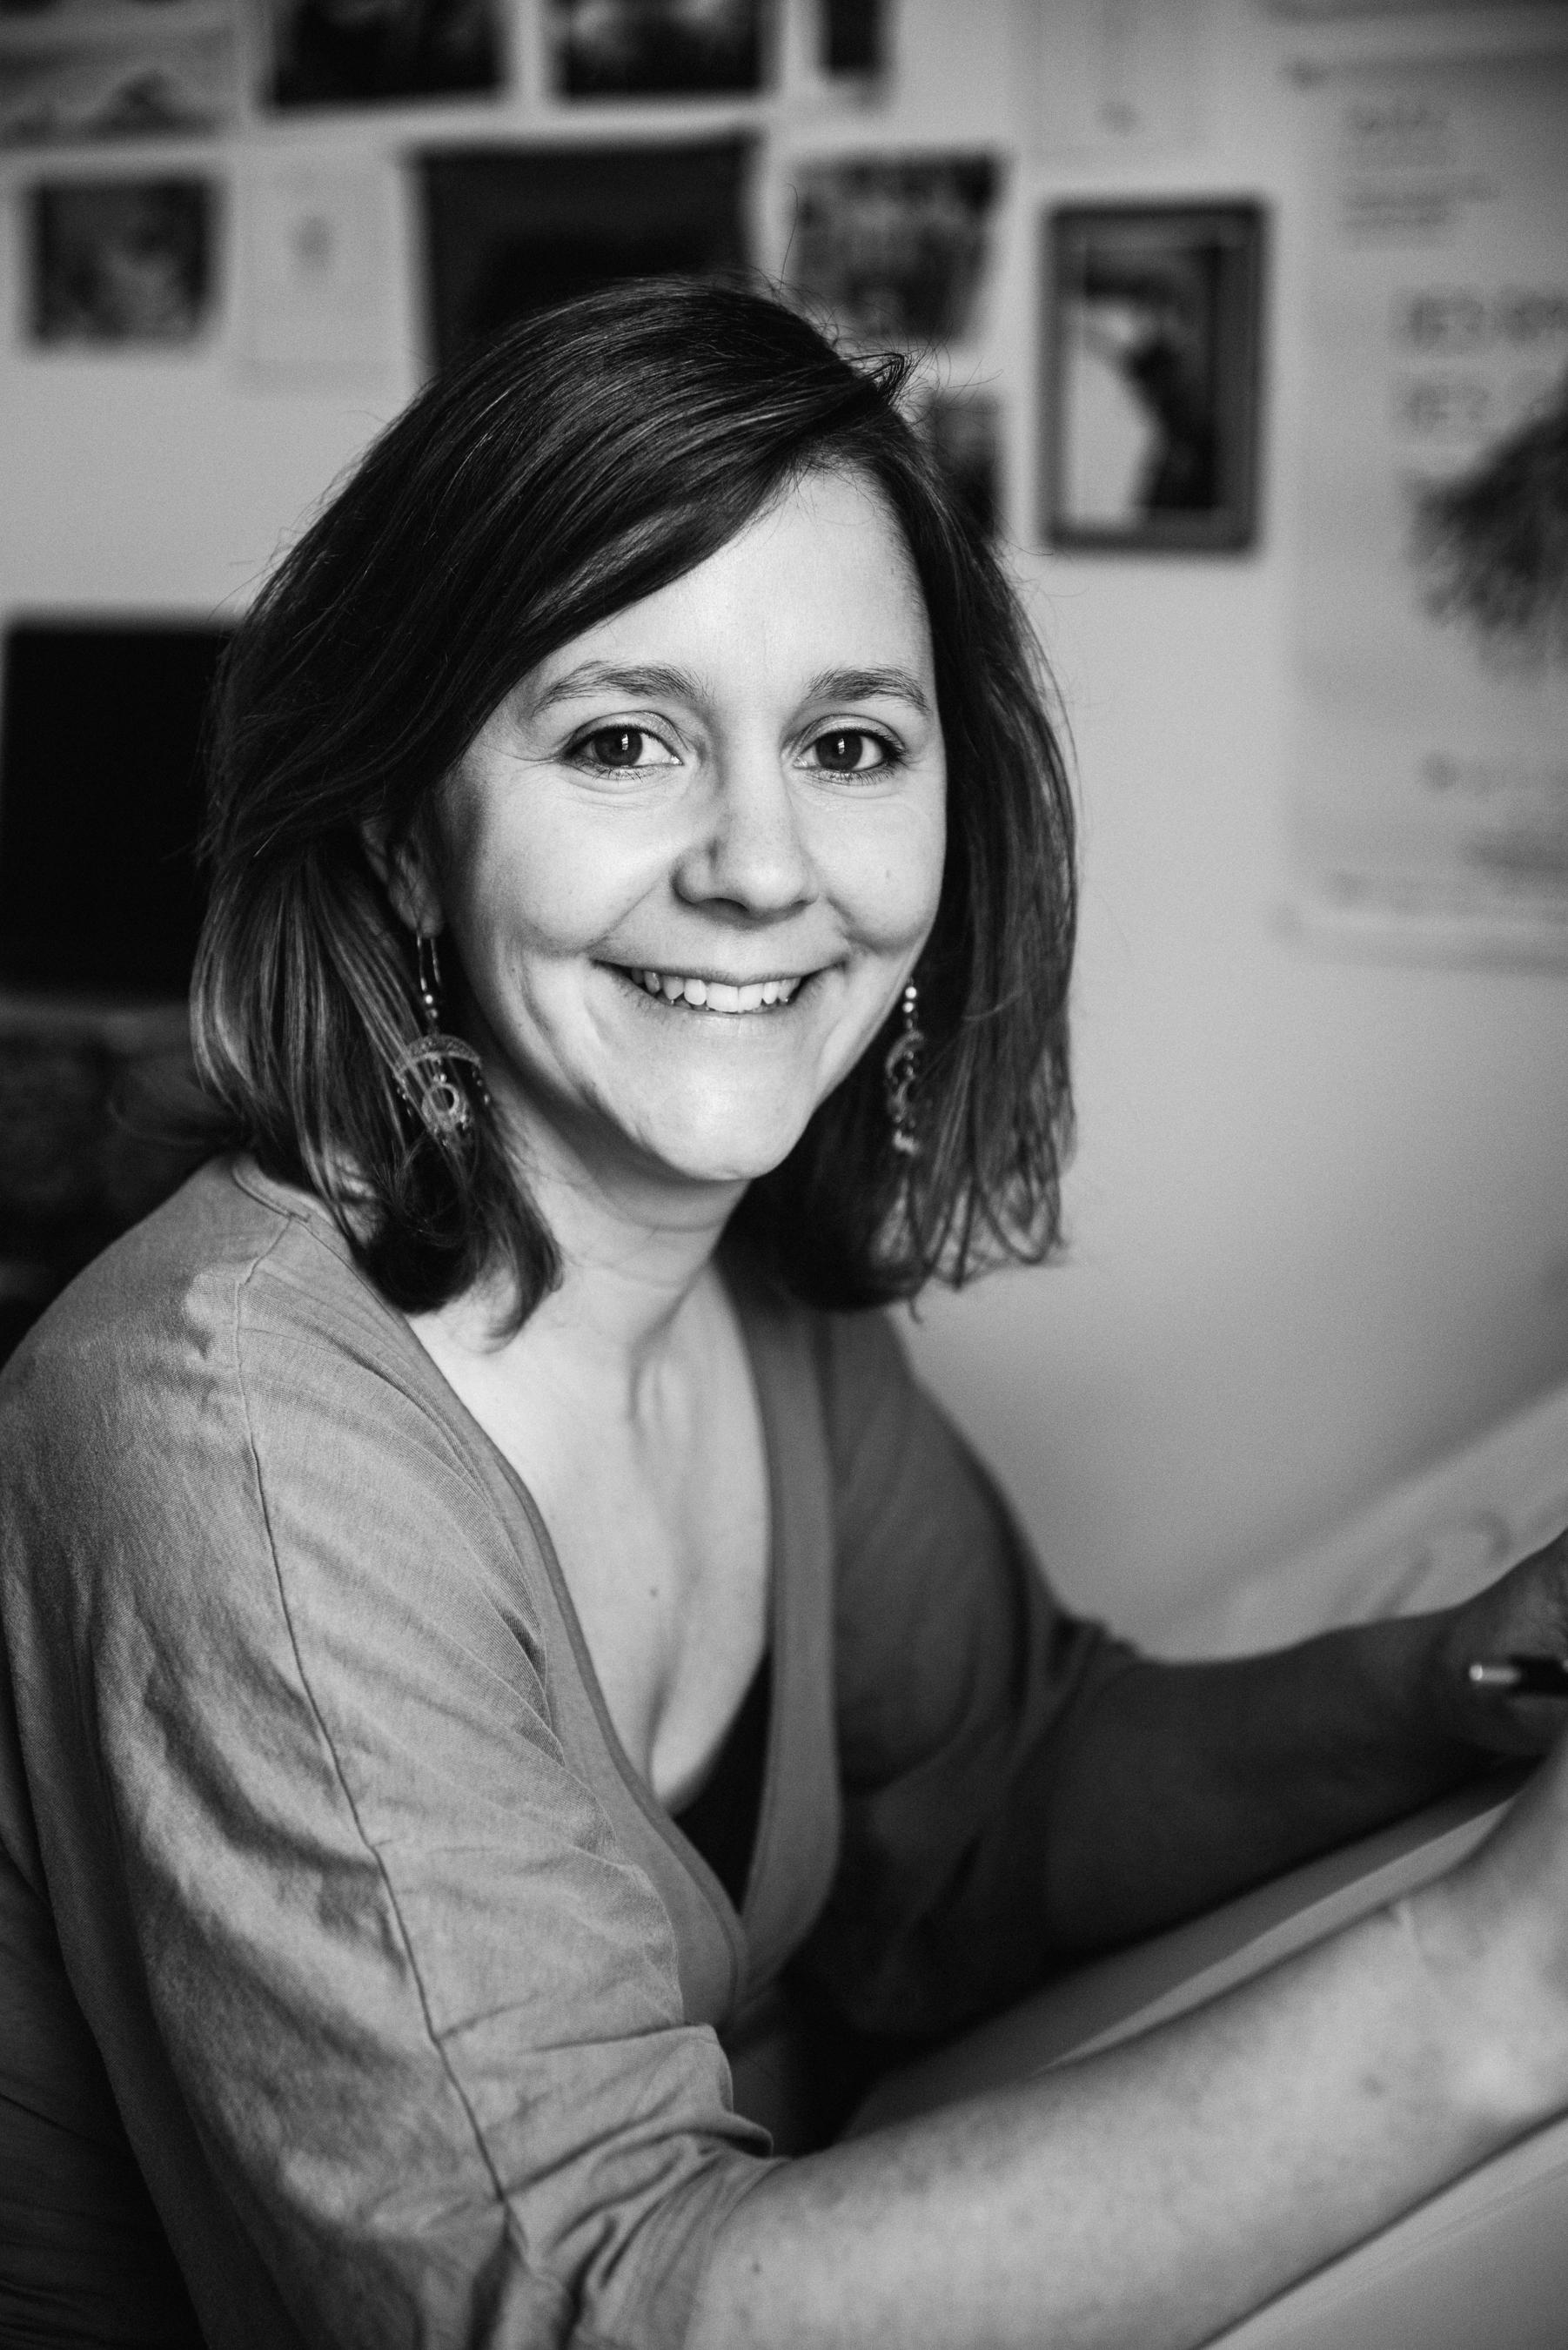 photo-d-une-illustratrice-a-l-oeuvre-Pauline-Stive_portrait-professionnel-documentaire-photographe-lifestyle_Marianne-Charland-252-2.jpg